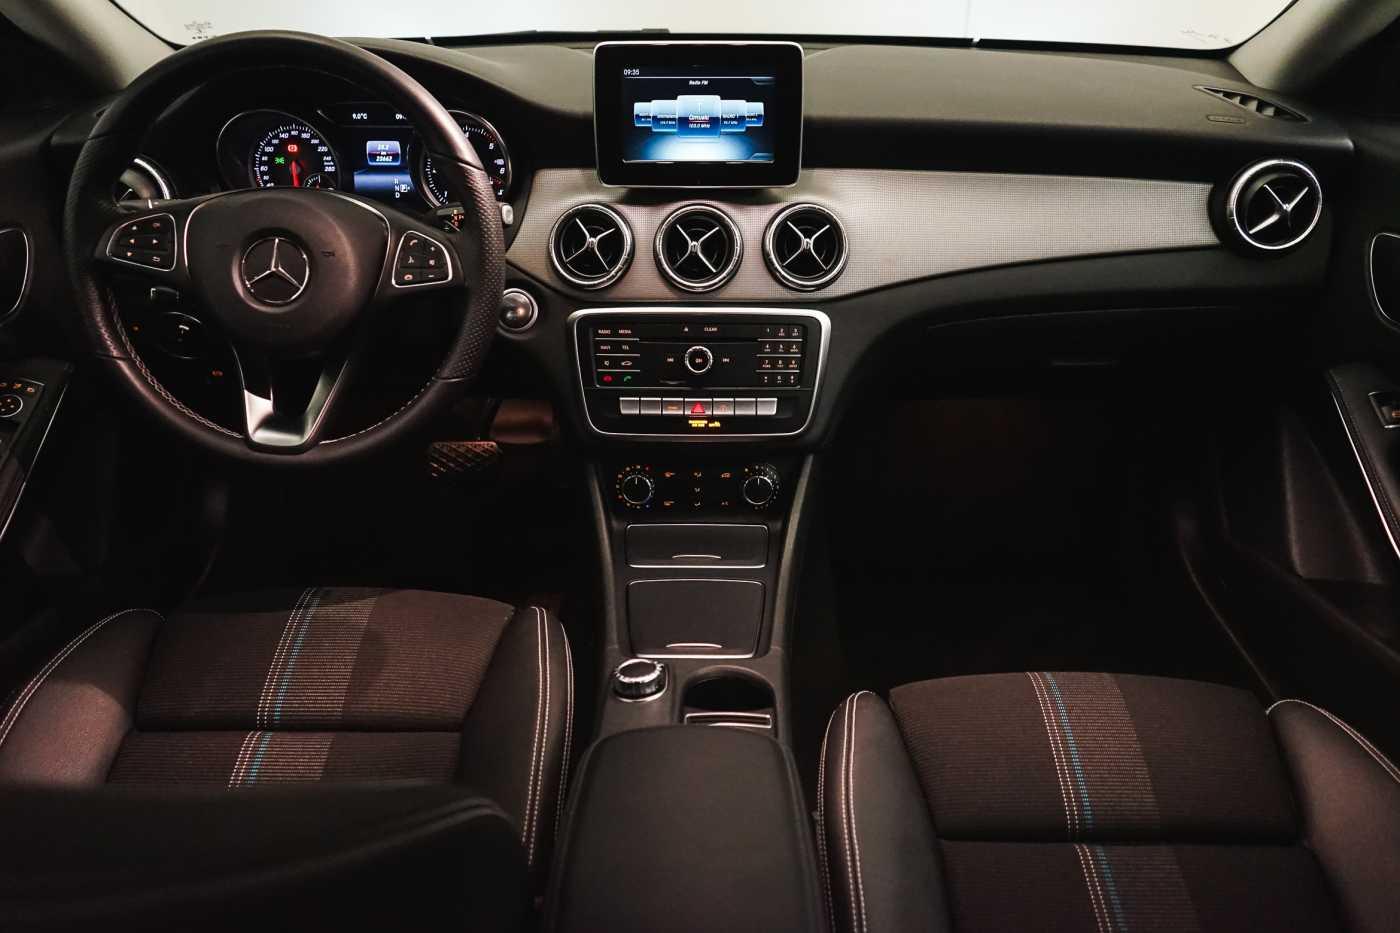 Mercedes CLA 200 d //Camera, Airco, Navi 11/33